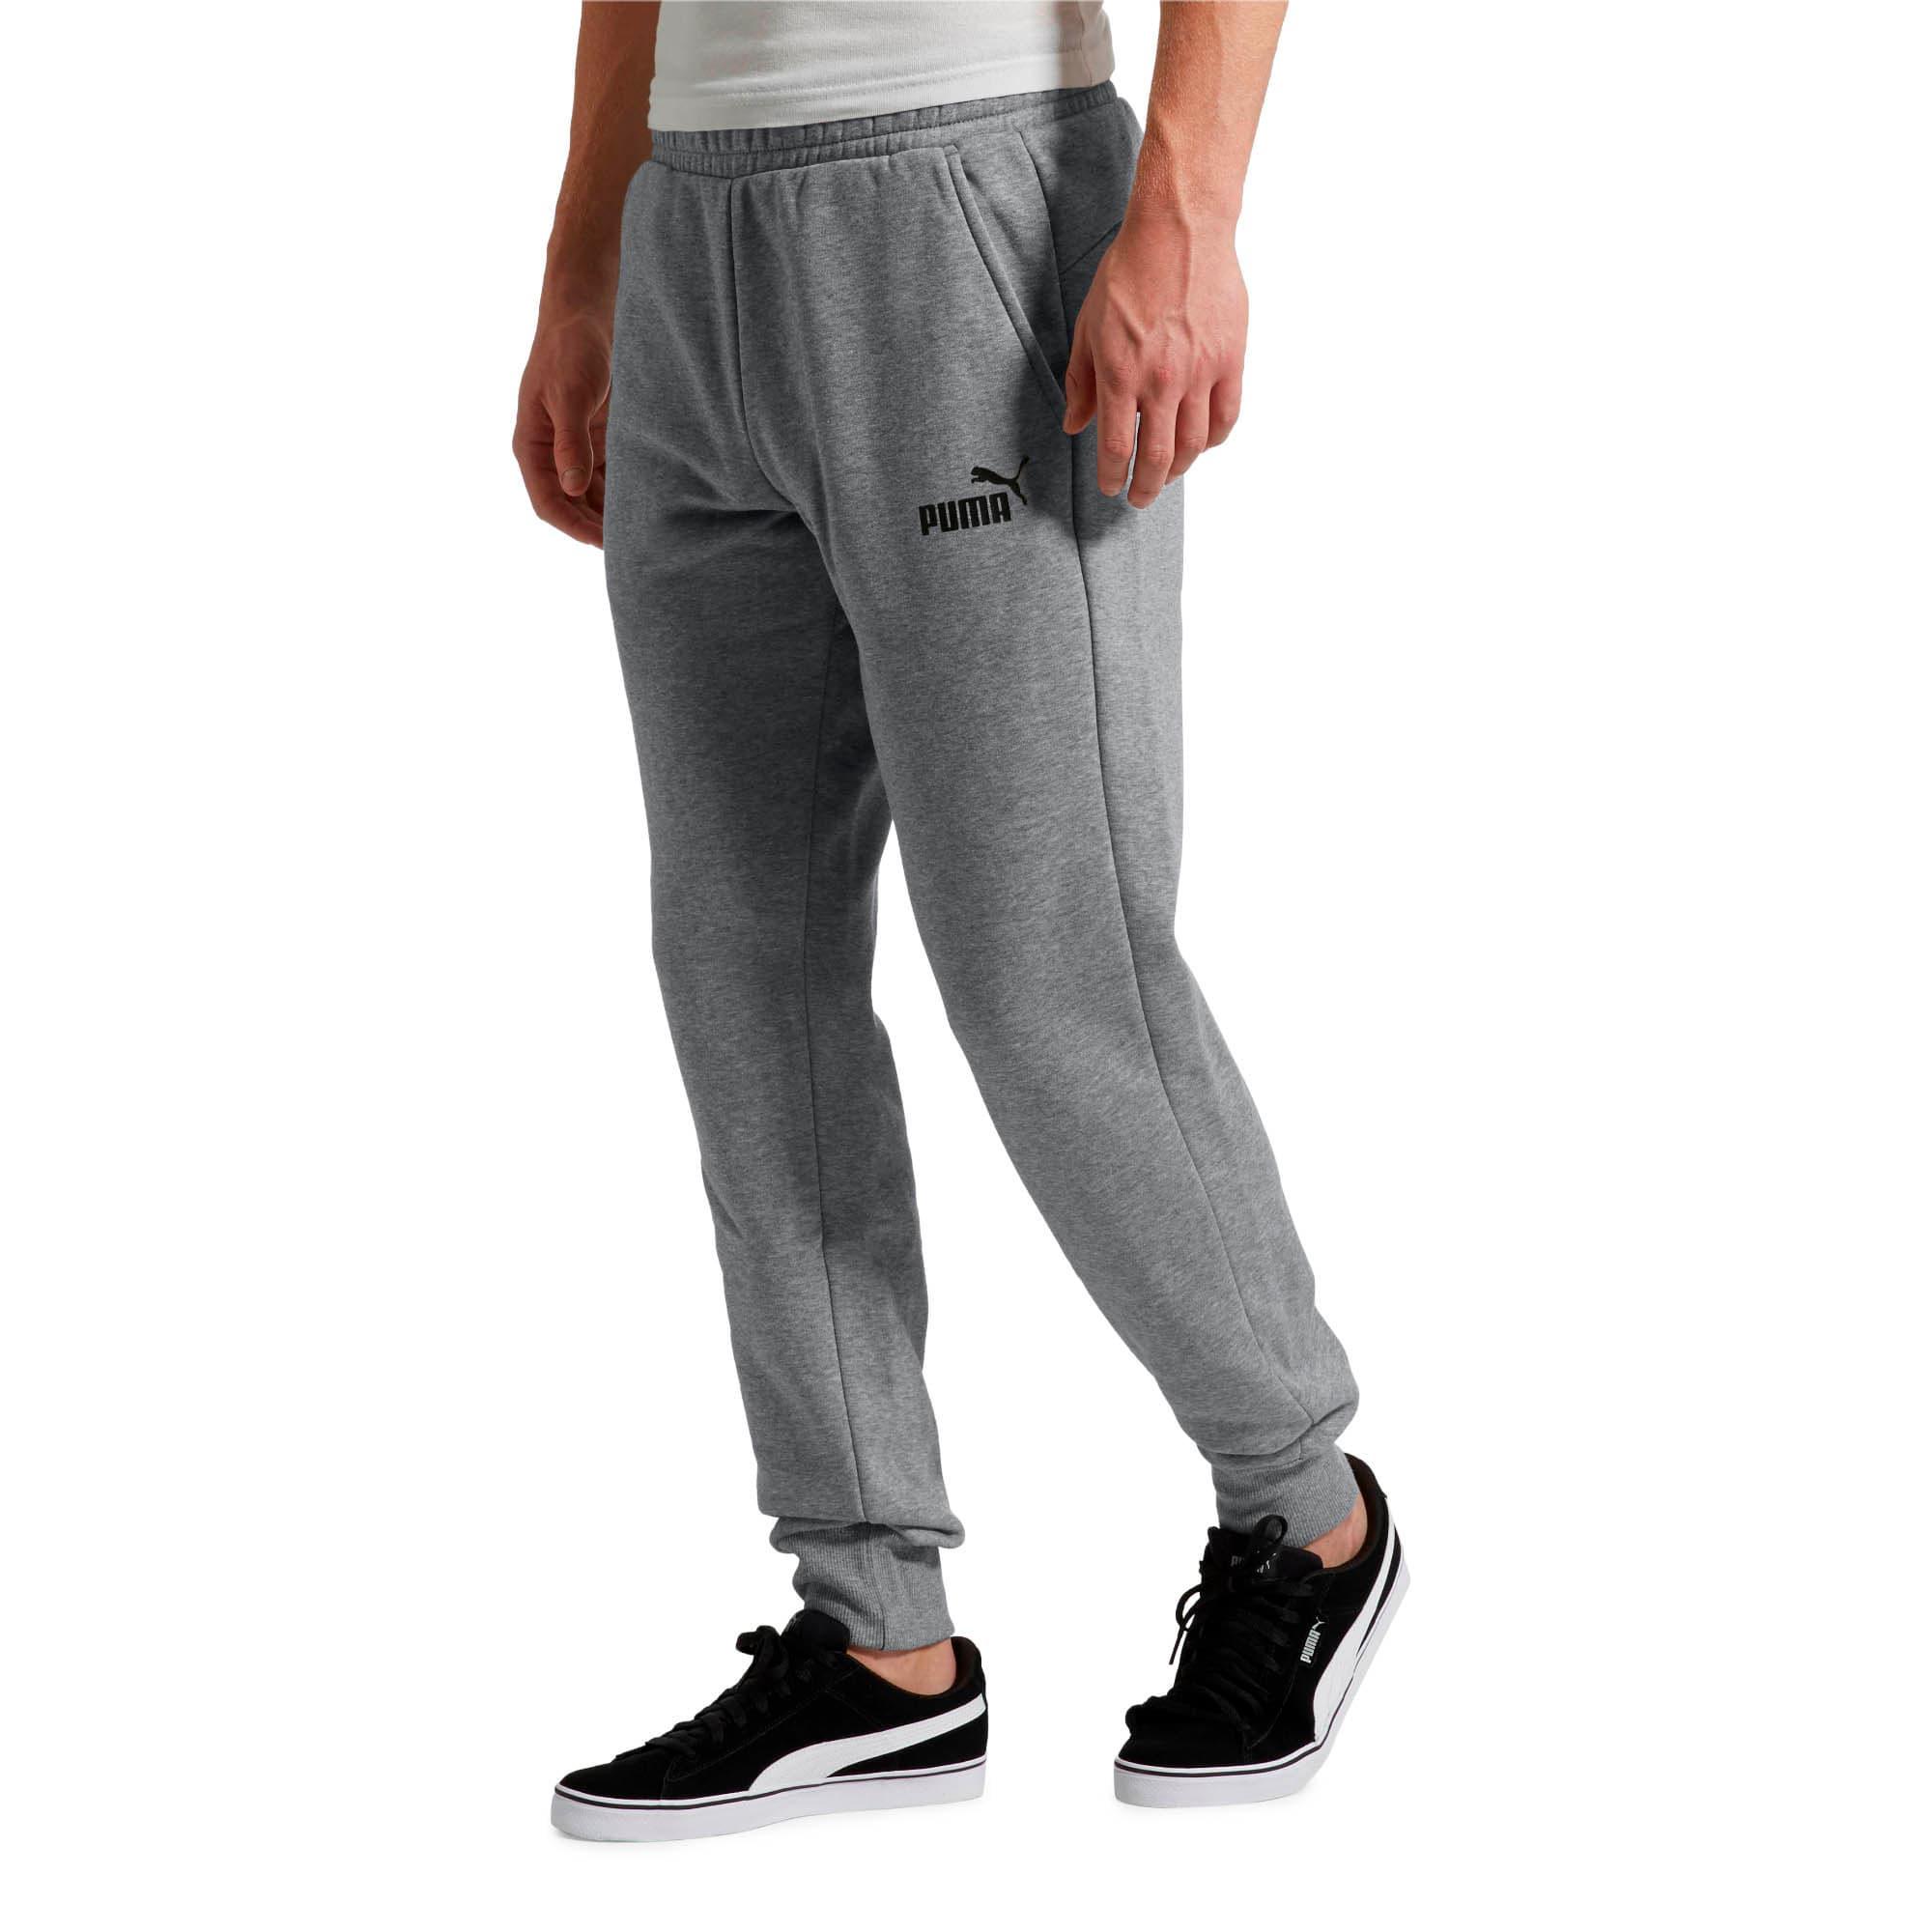 Thumbnail 1 of Essentials Men's Fleece Knit Pants, Medium Gray Heather, medium